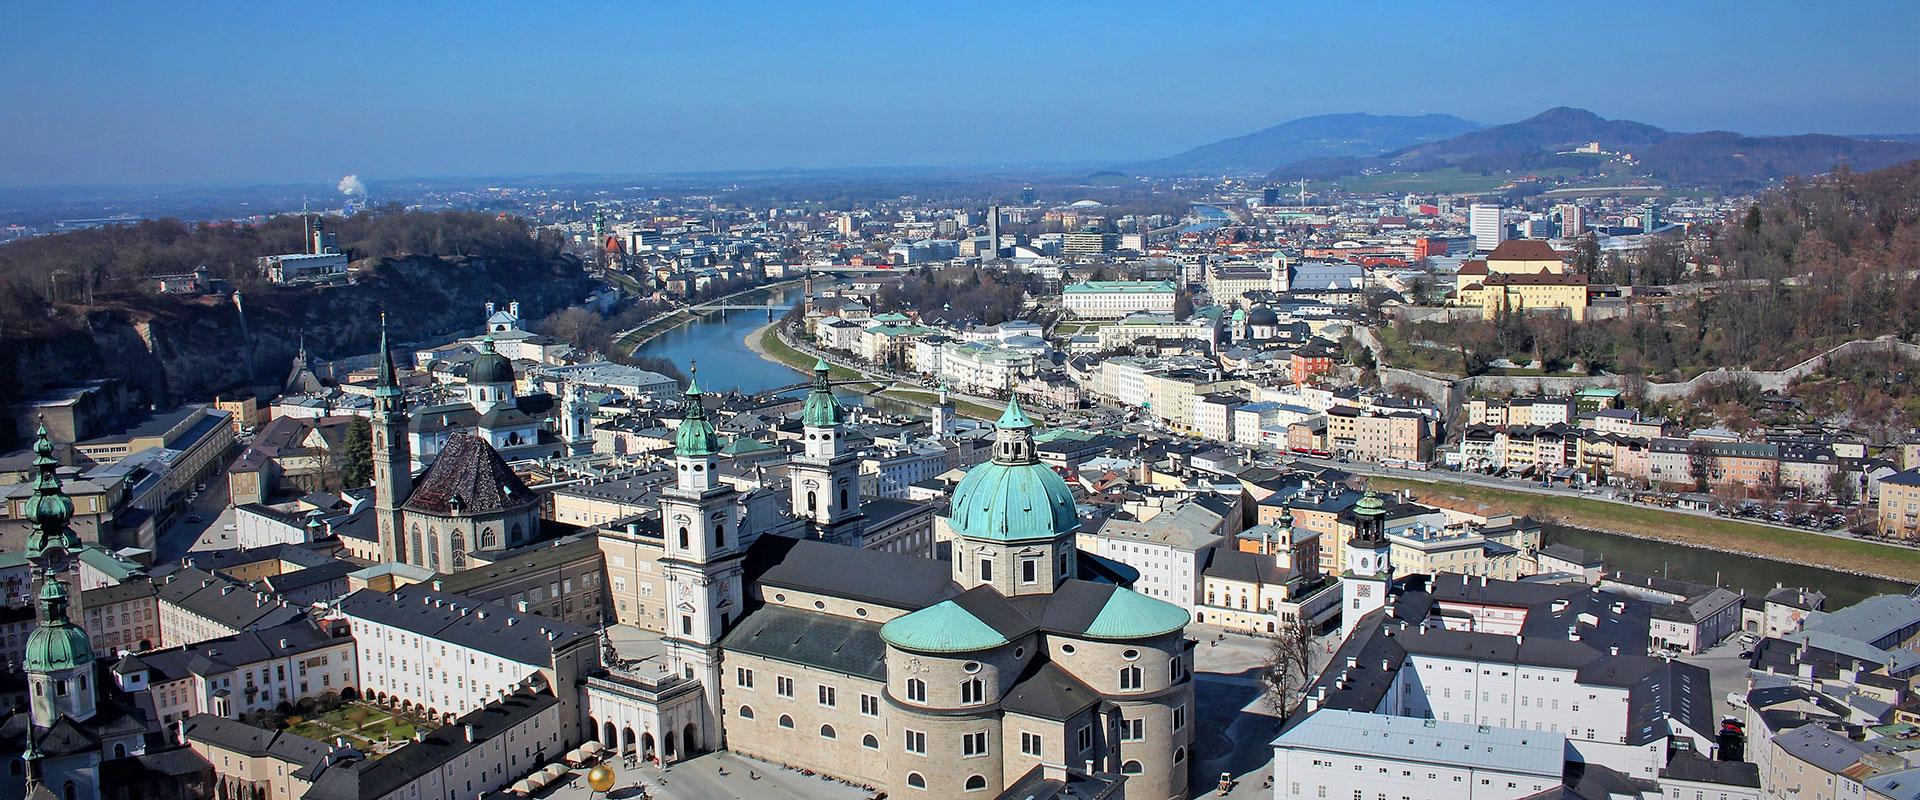 Salzburg and Salt Mines Private Tour